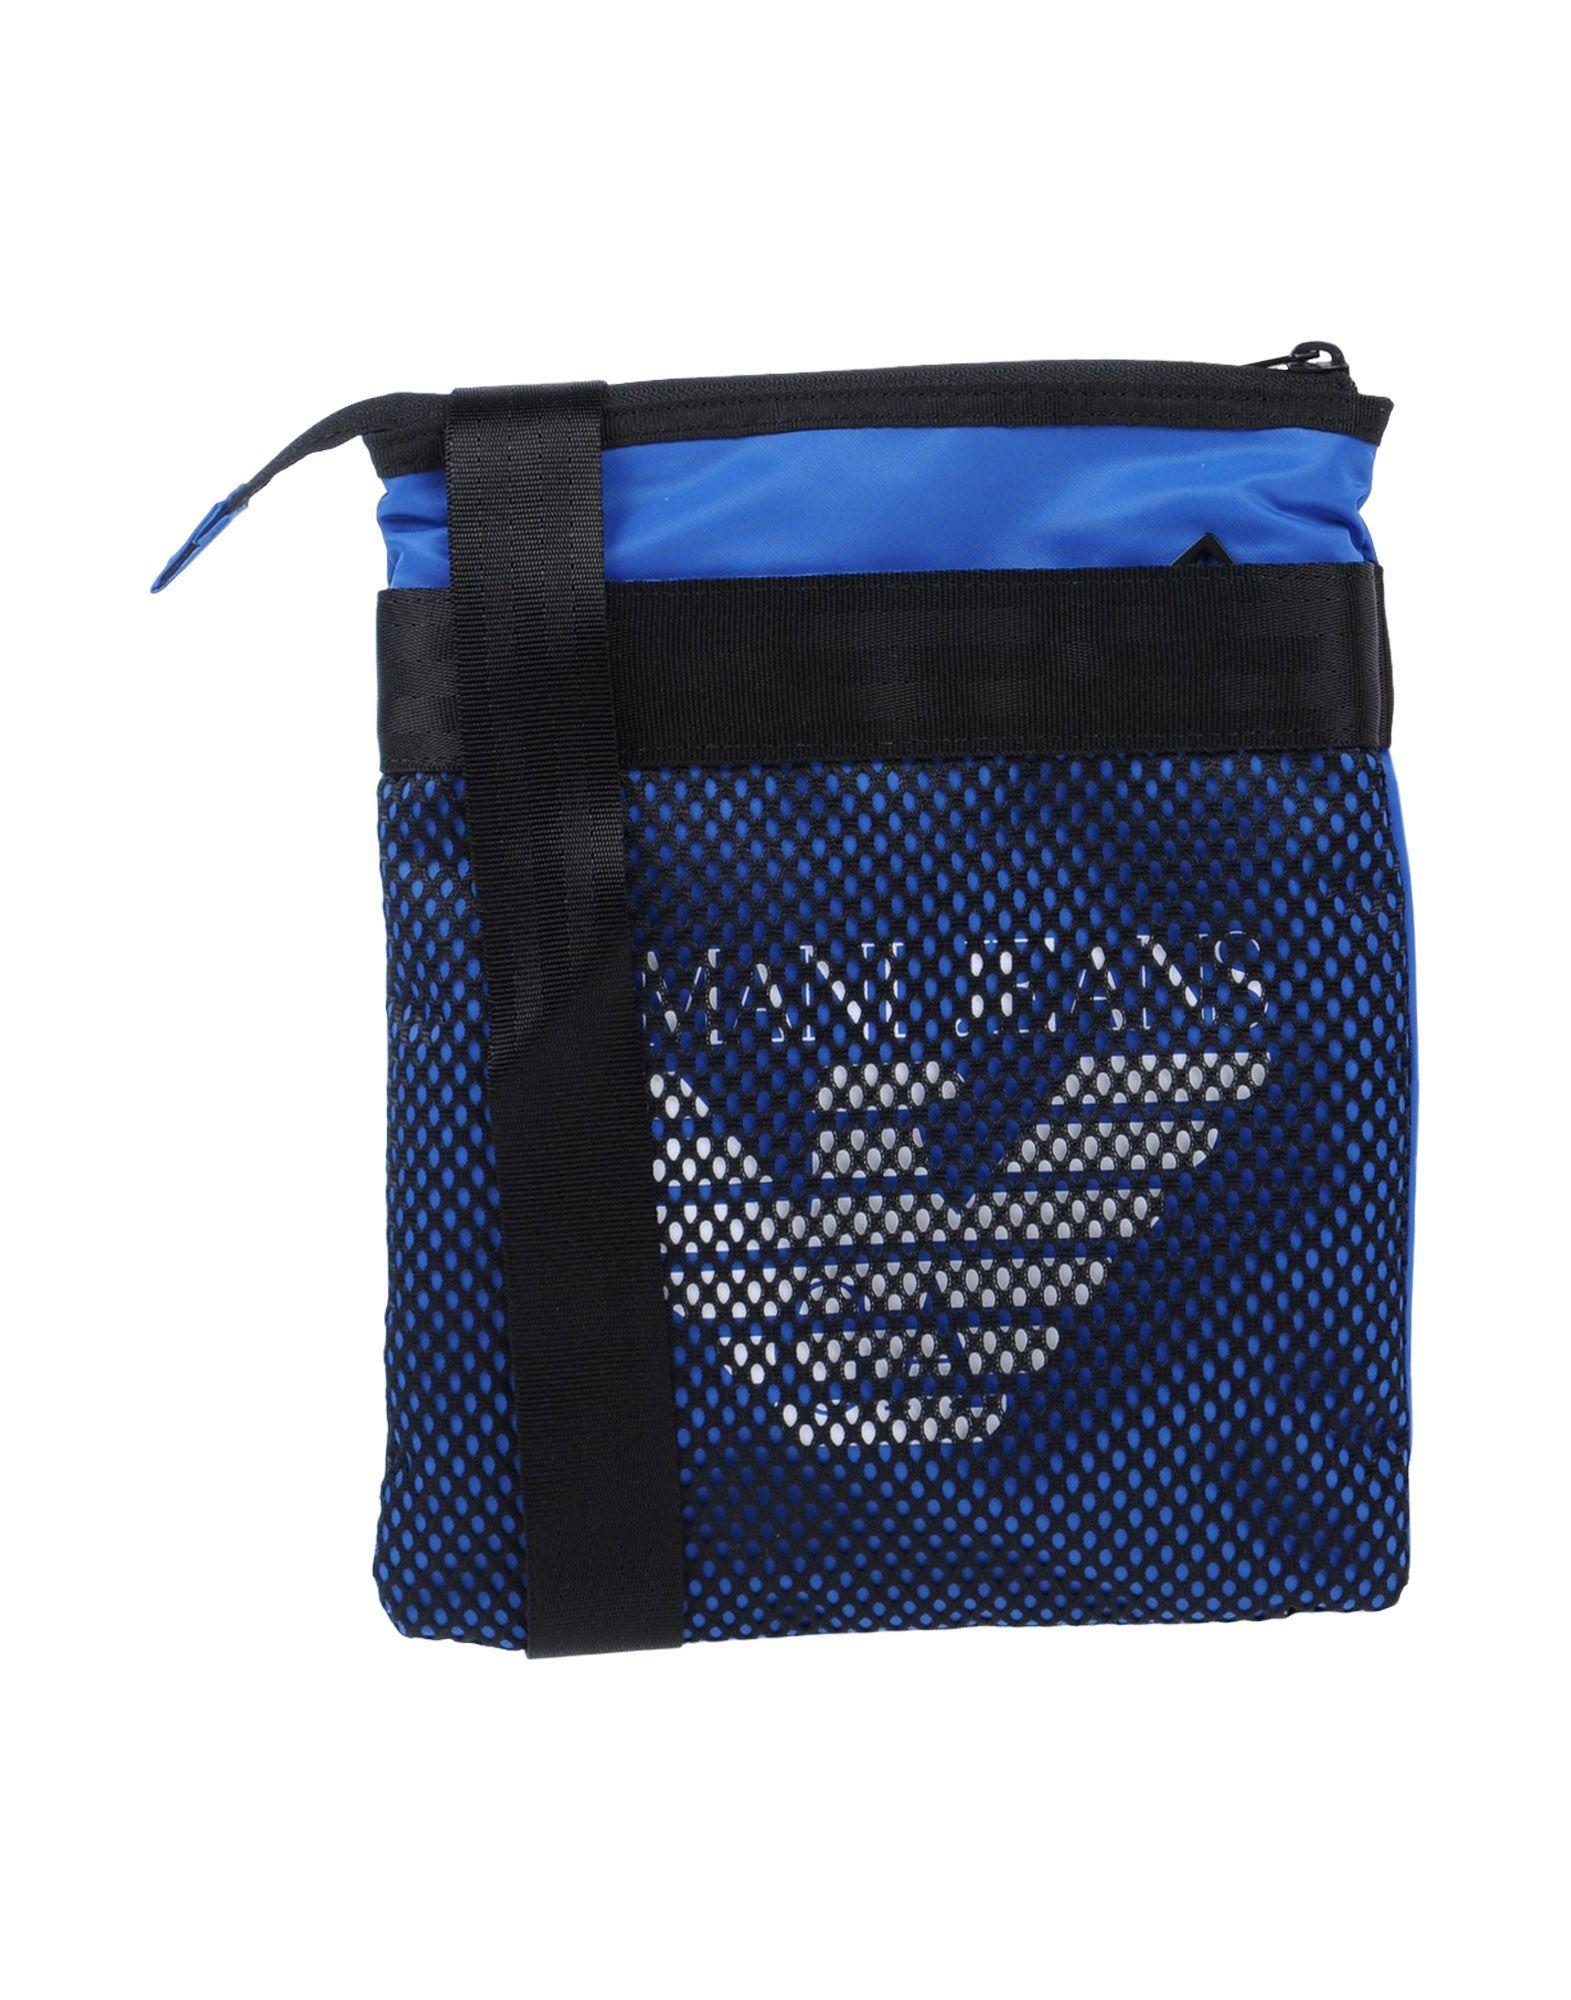 armanijeans  bags  shoulder bags  denim   cbbeb7df8682e